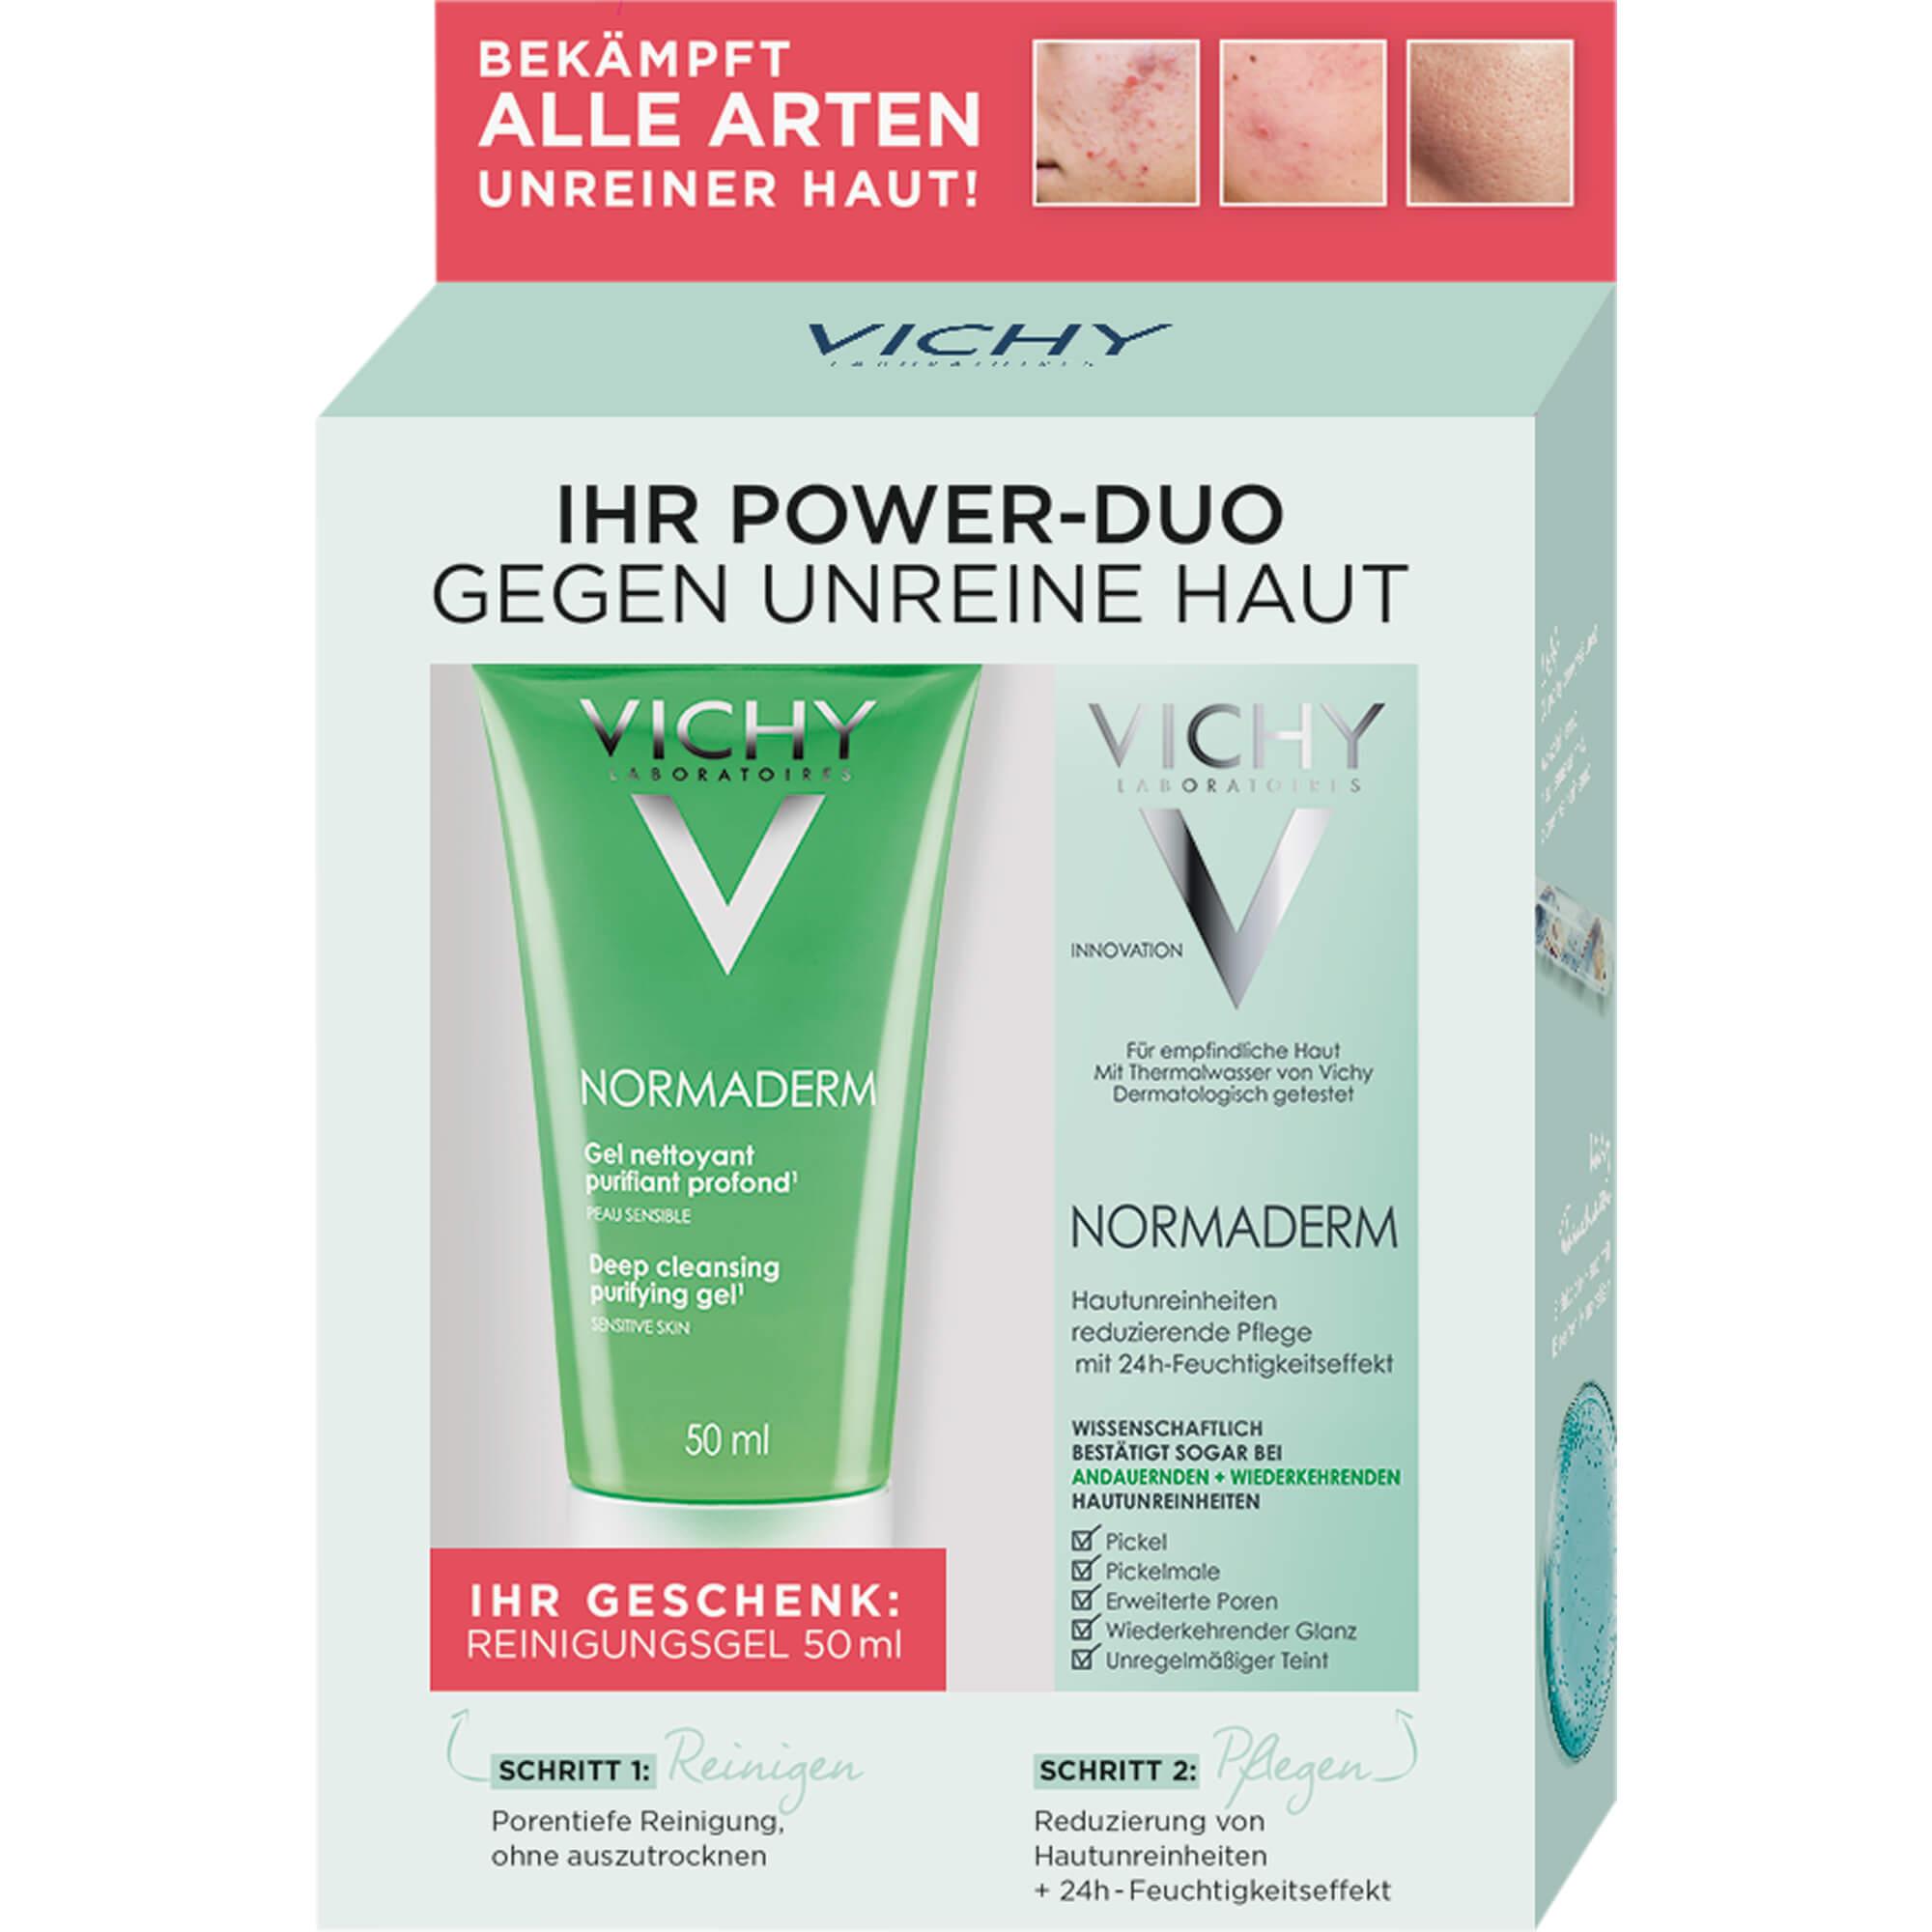 VICHY-NORMADERM-Feucht-Pflege-Creme